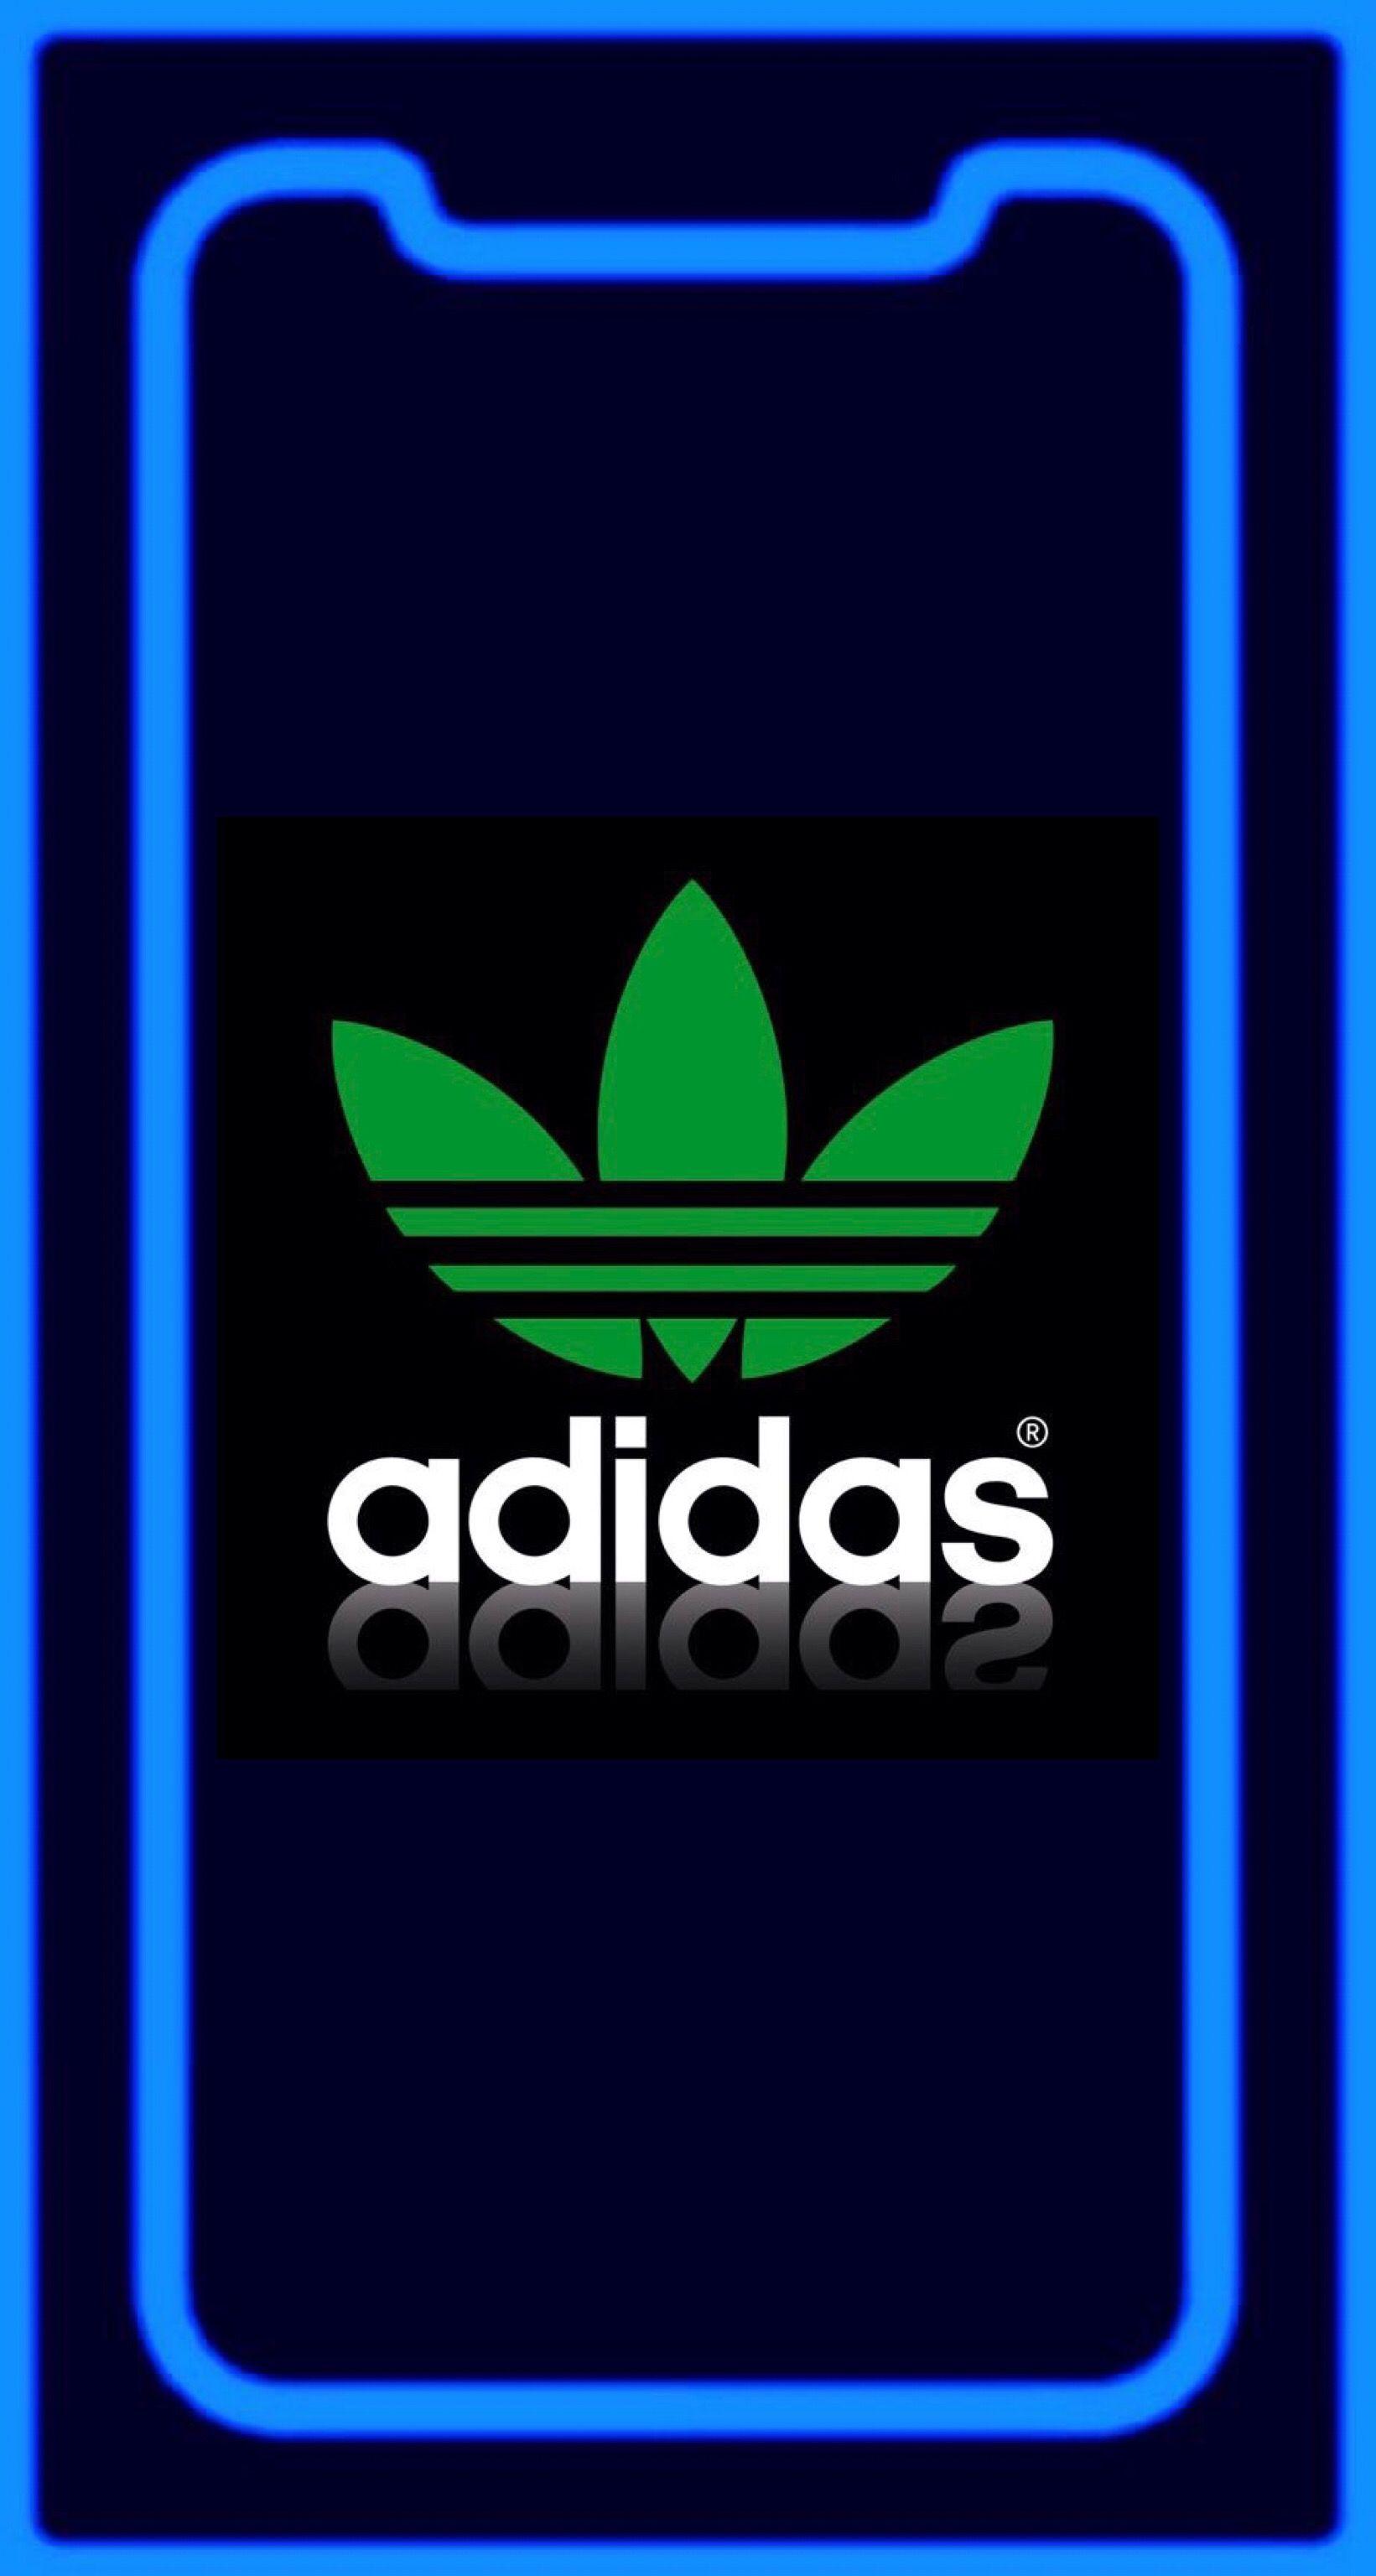 Wallpaper Iphone X Adidas Green Samsung Galaxy Wallpaper Android Adidas Logo Wallpapers Adidas Wallpapers